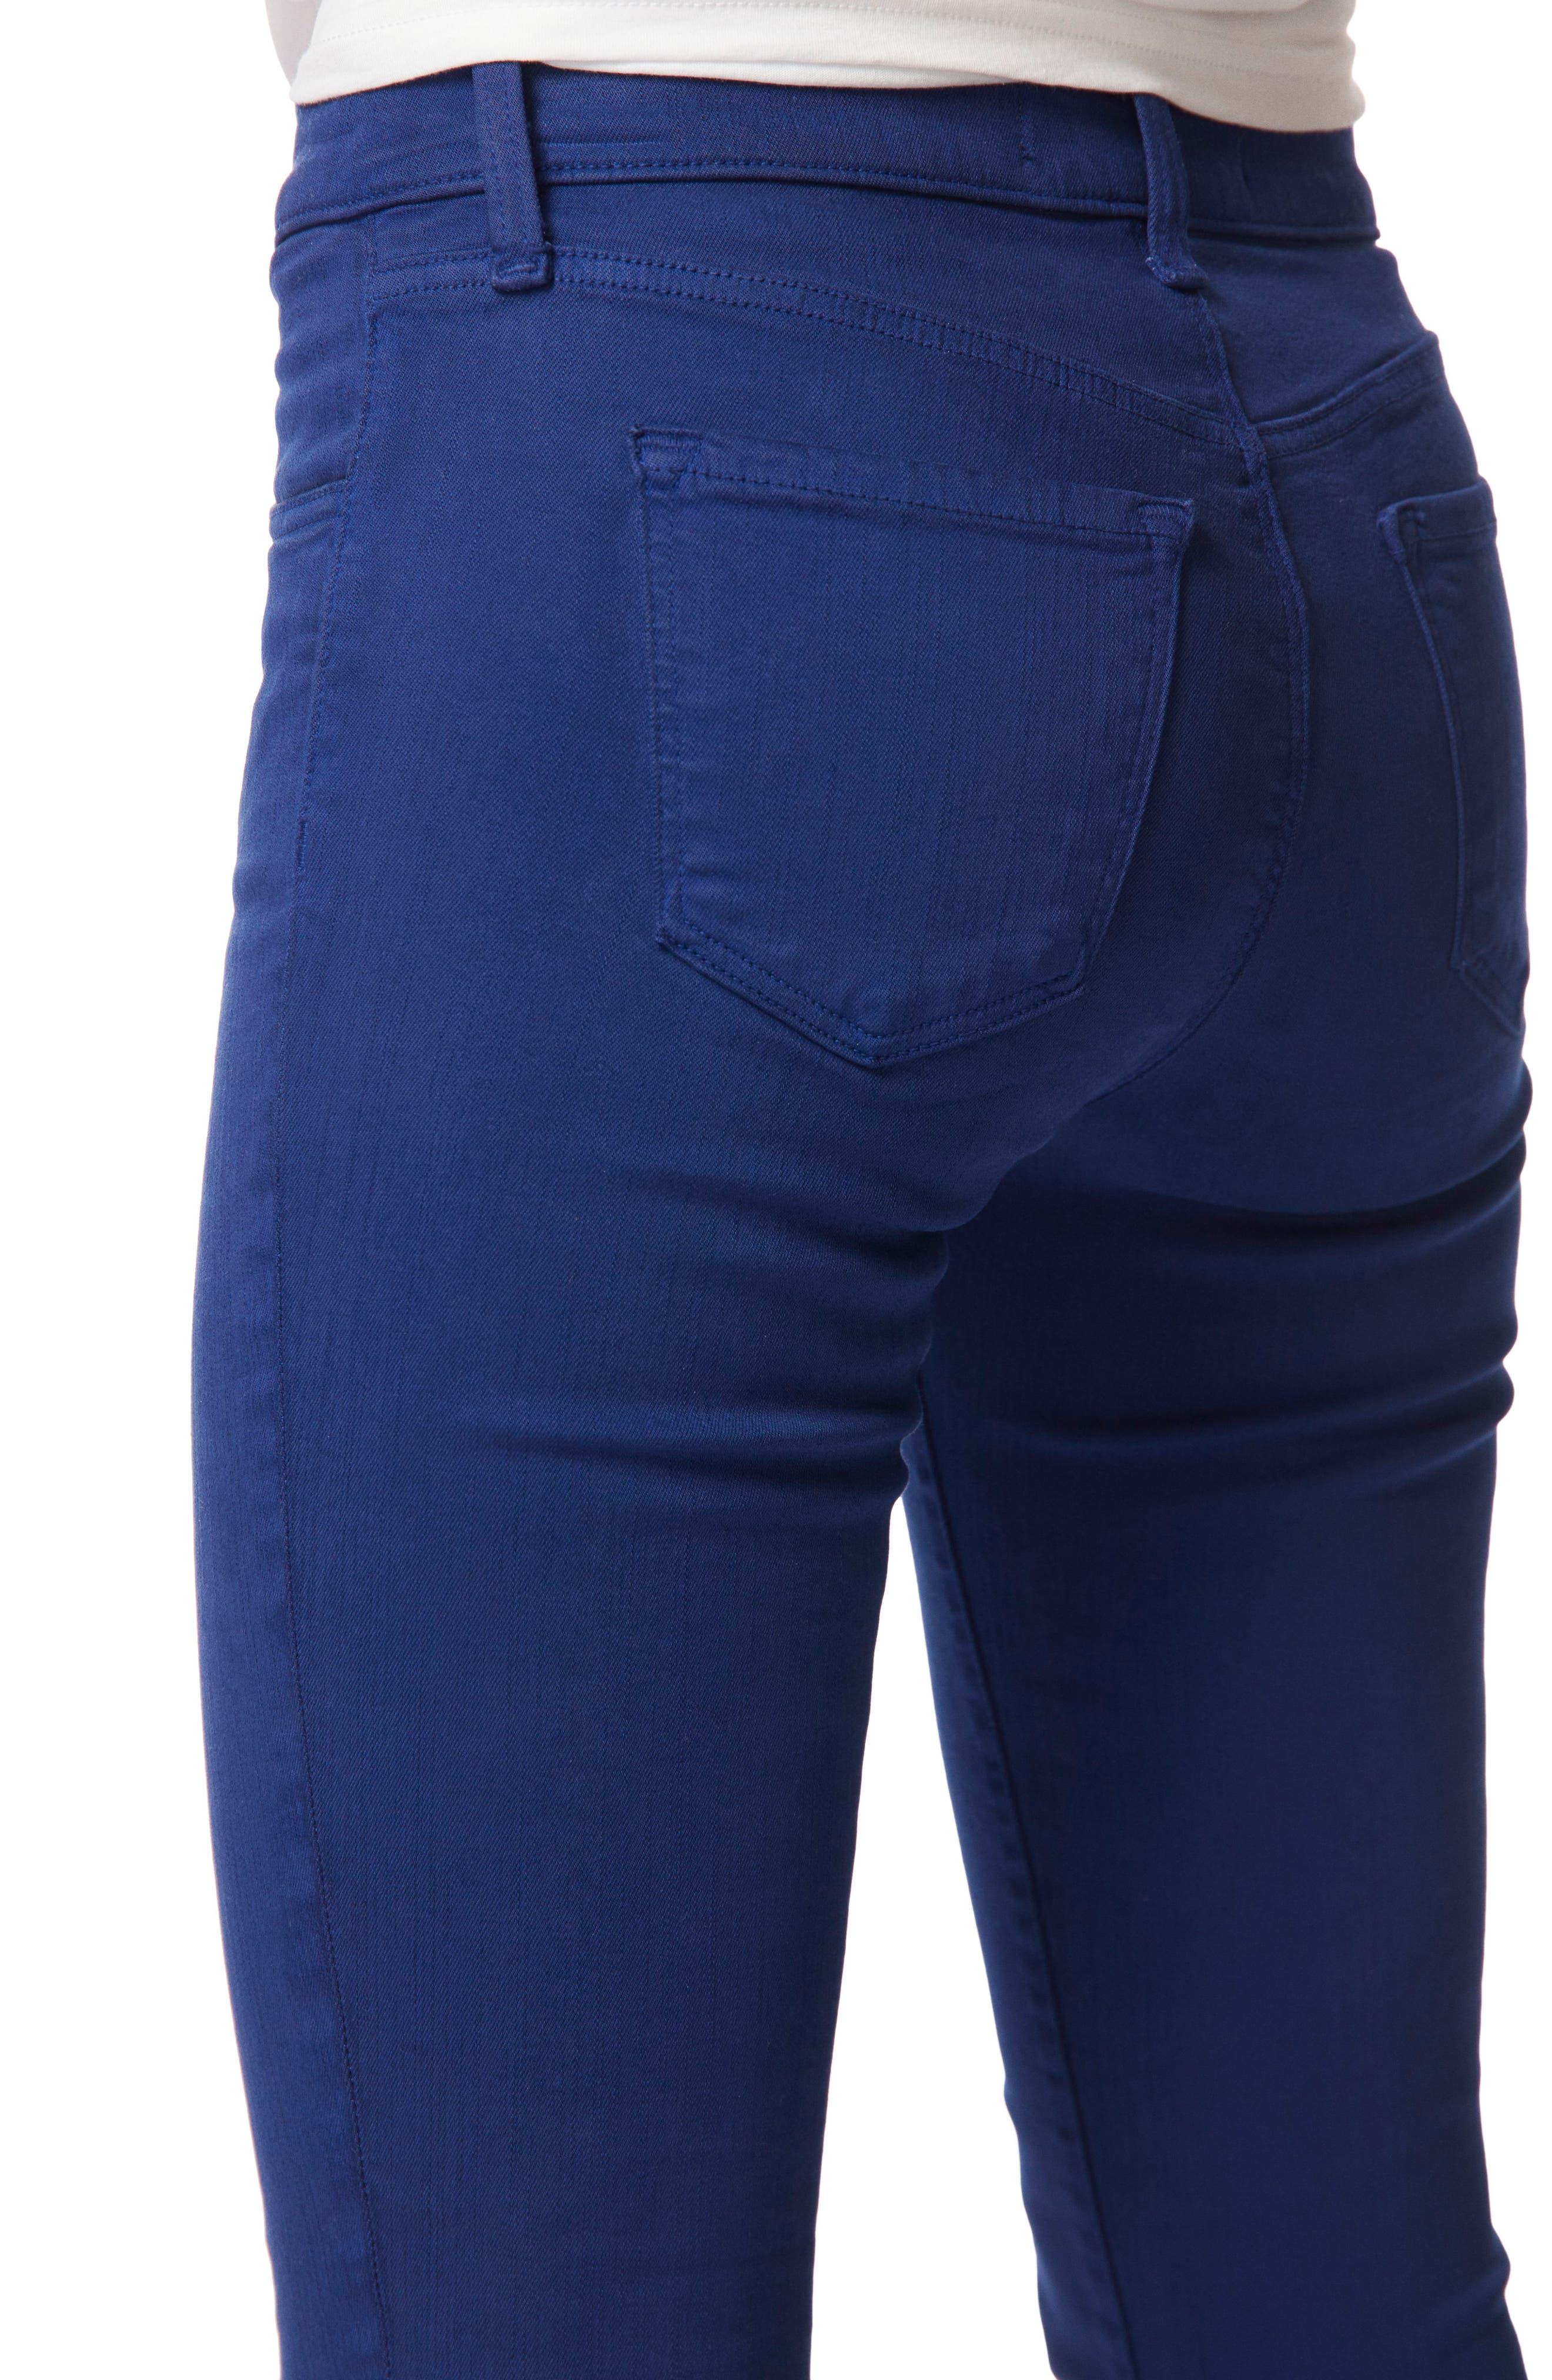 620 Mid Rise Super Skinny Jeans,                             Alternate thumbnail 4, color,                             Electric Sea Destruct